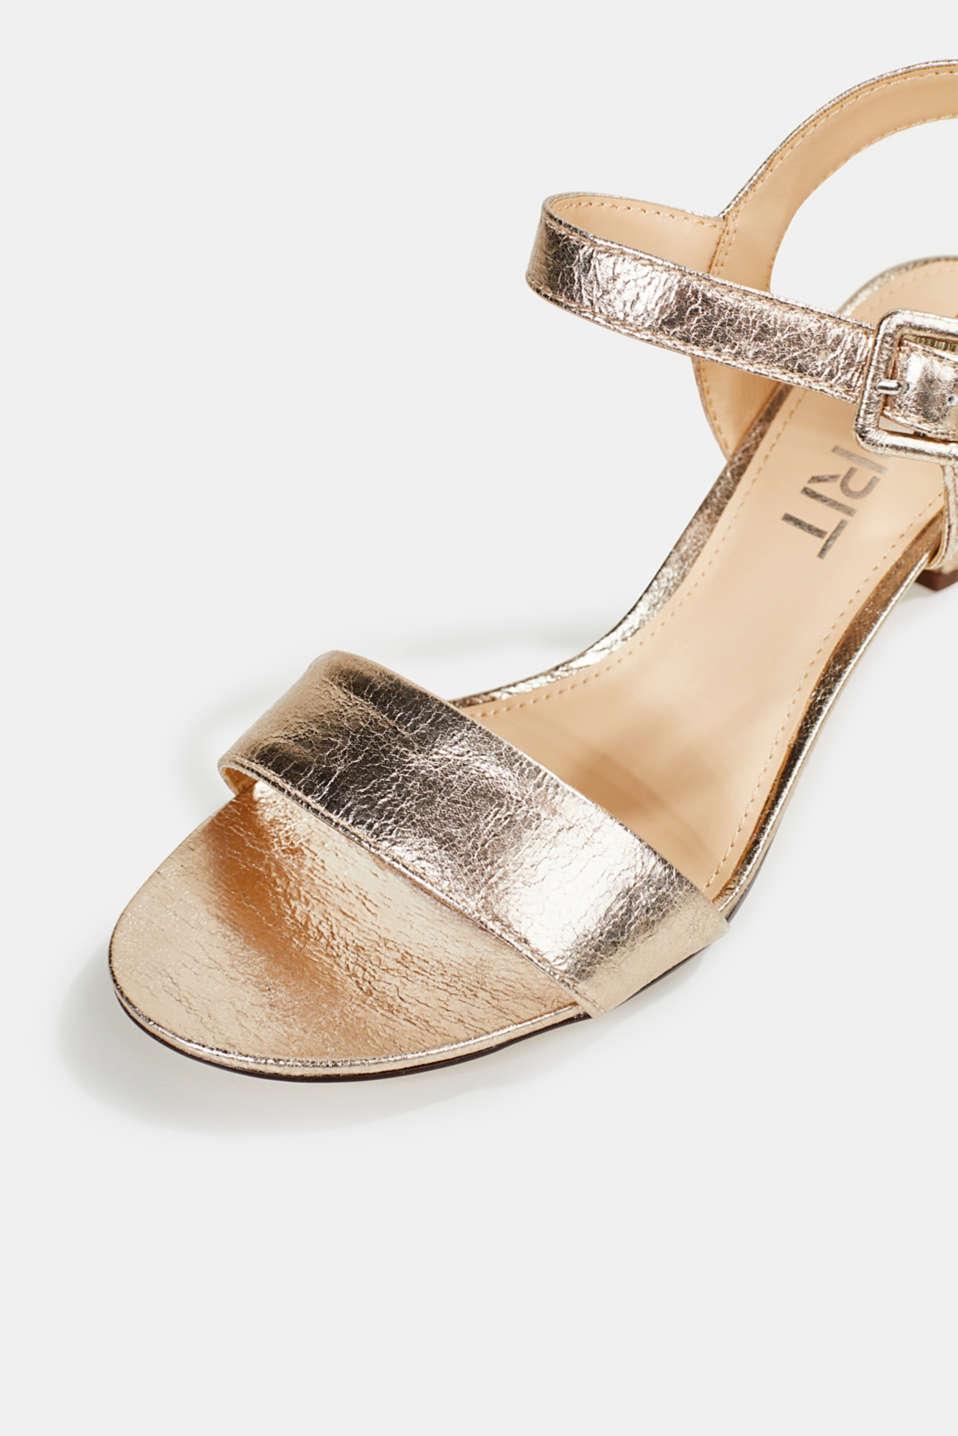 Sandals in a crushed metallic look, SKIN BEIGE, detail image number 4